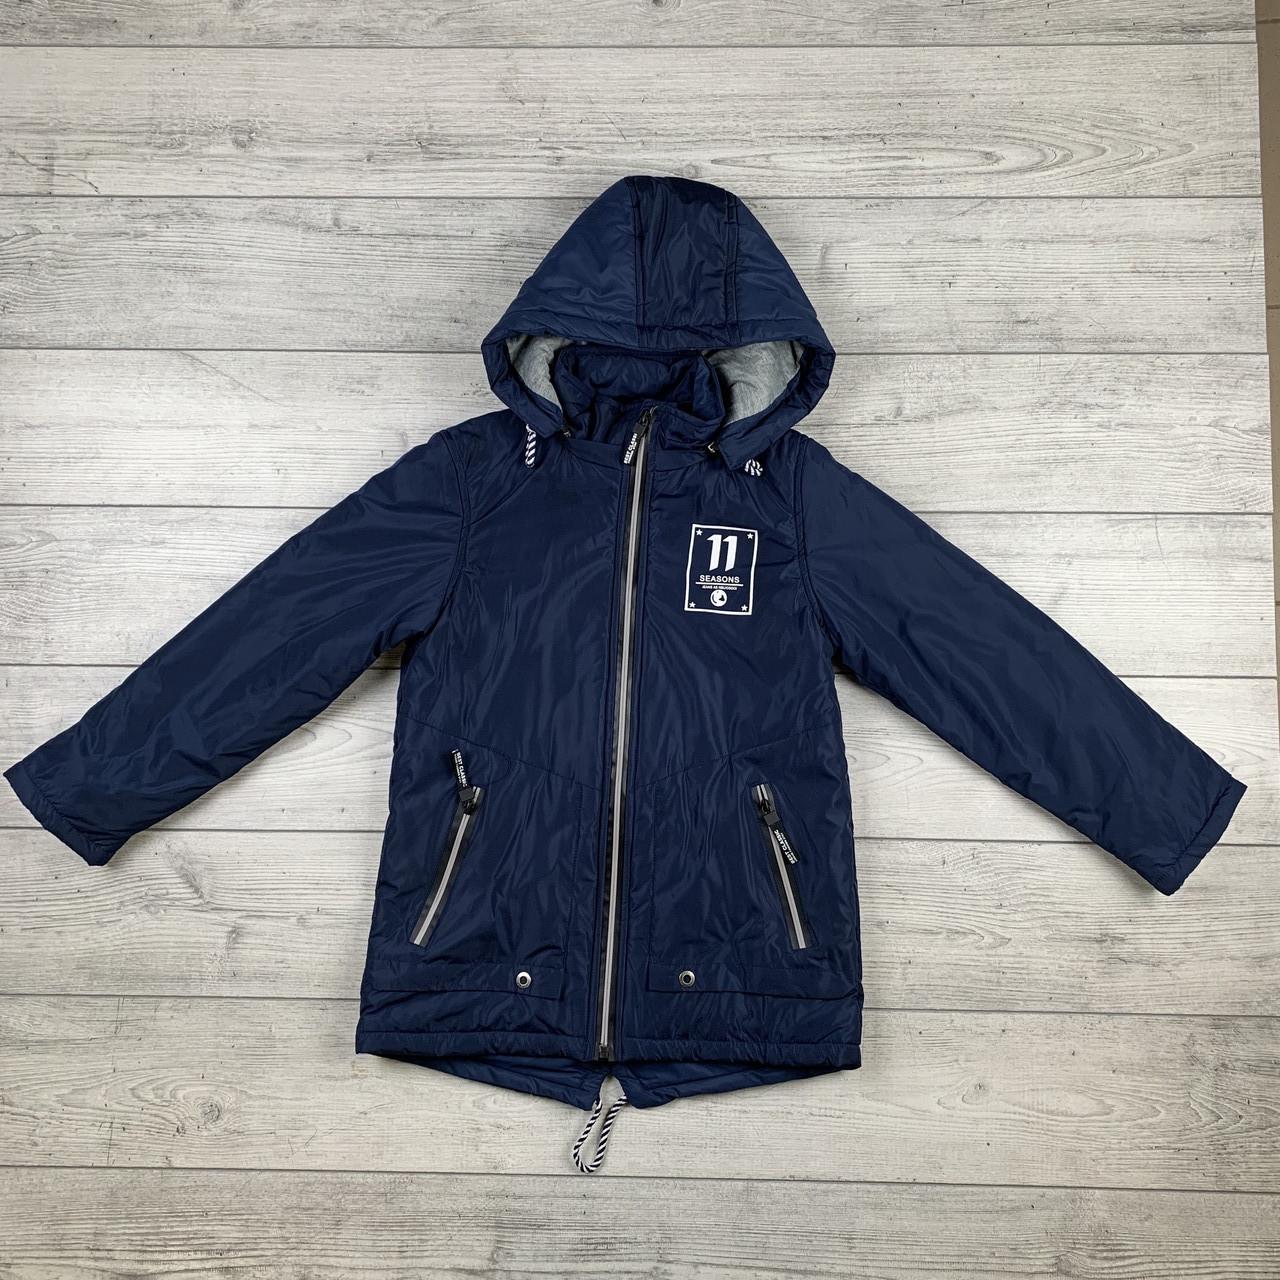 Осенняя курточка на мальчика 7-10 лет, размеры 122-140